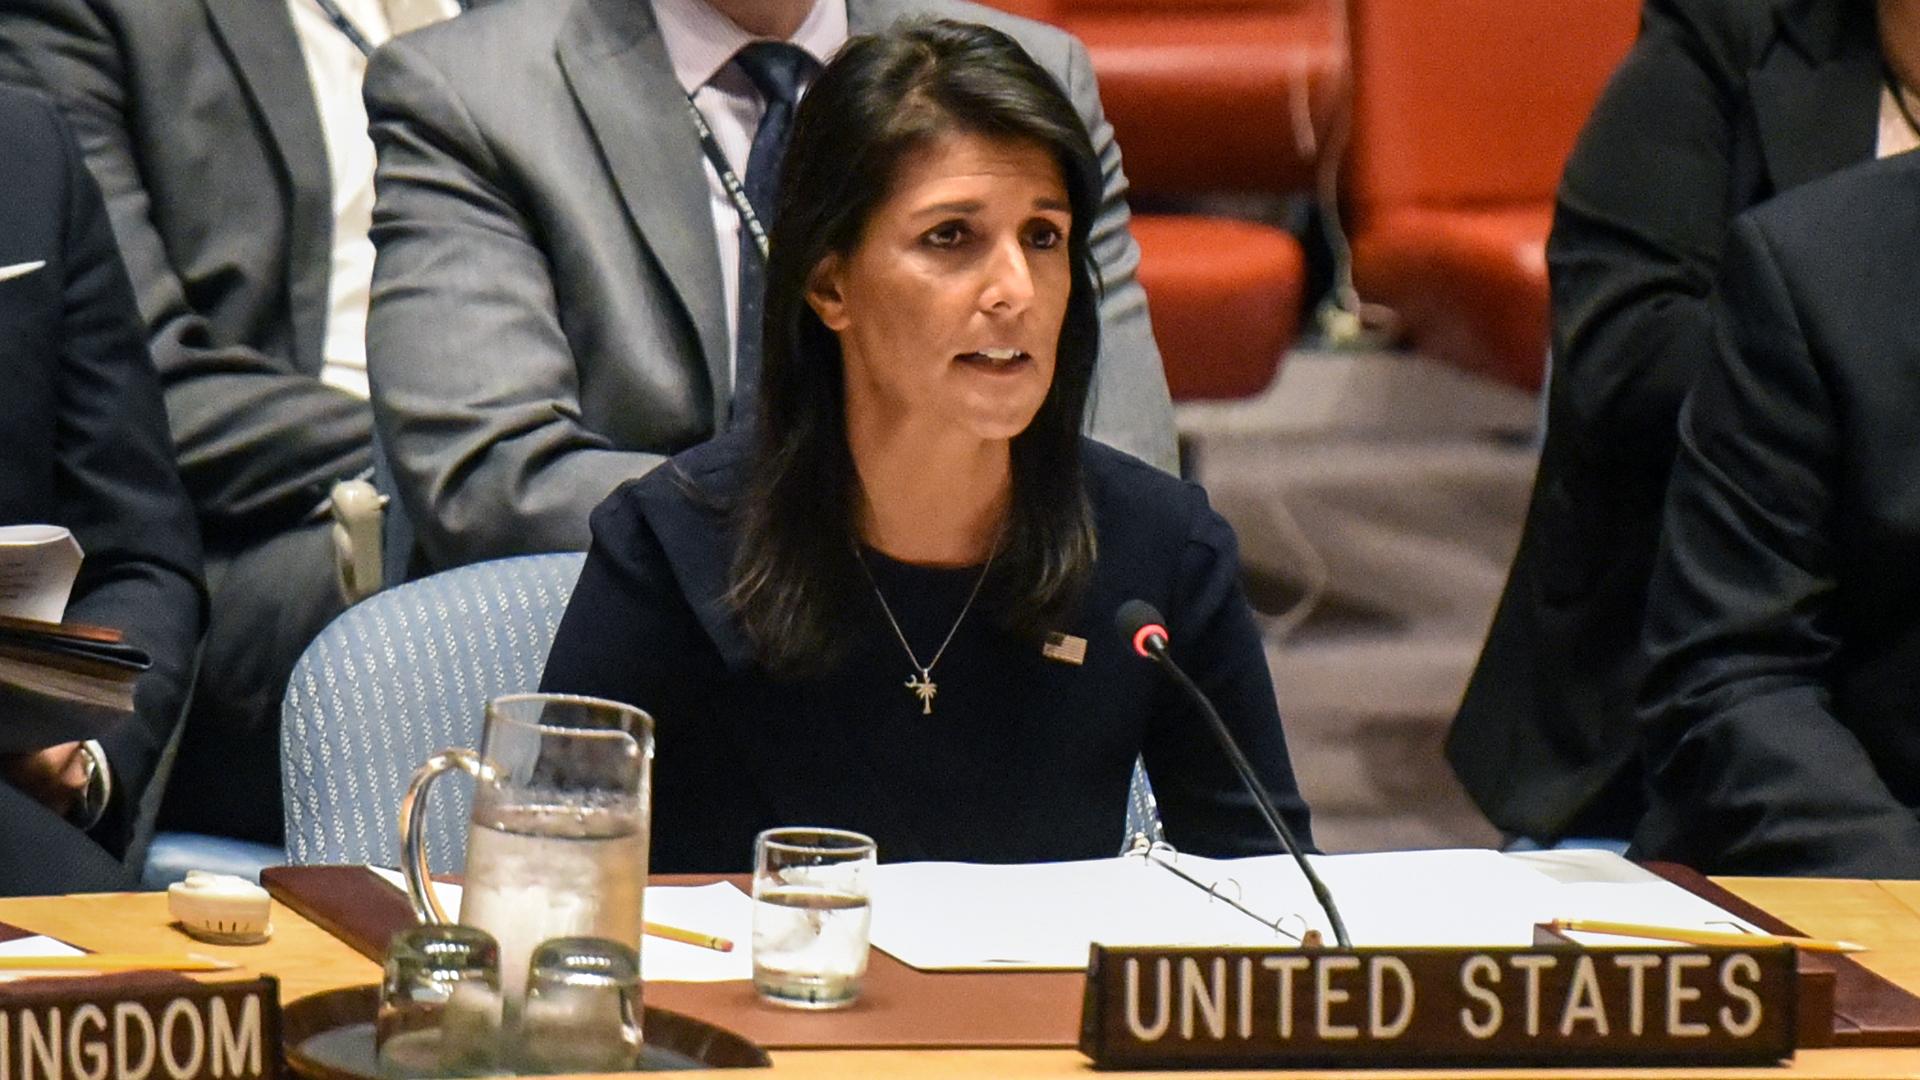 Nikki Haley at UN meeting on North Korea-159532.jpg71620993